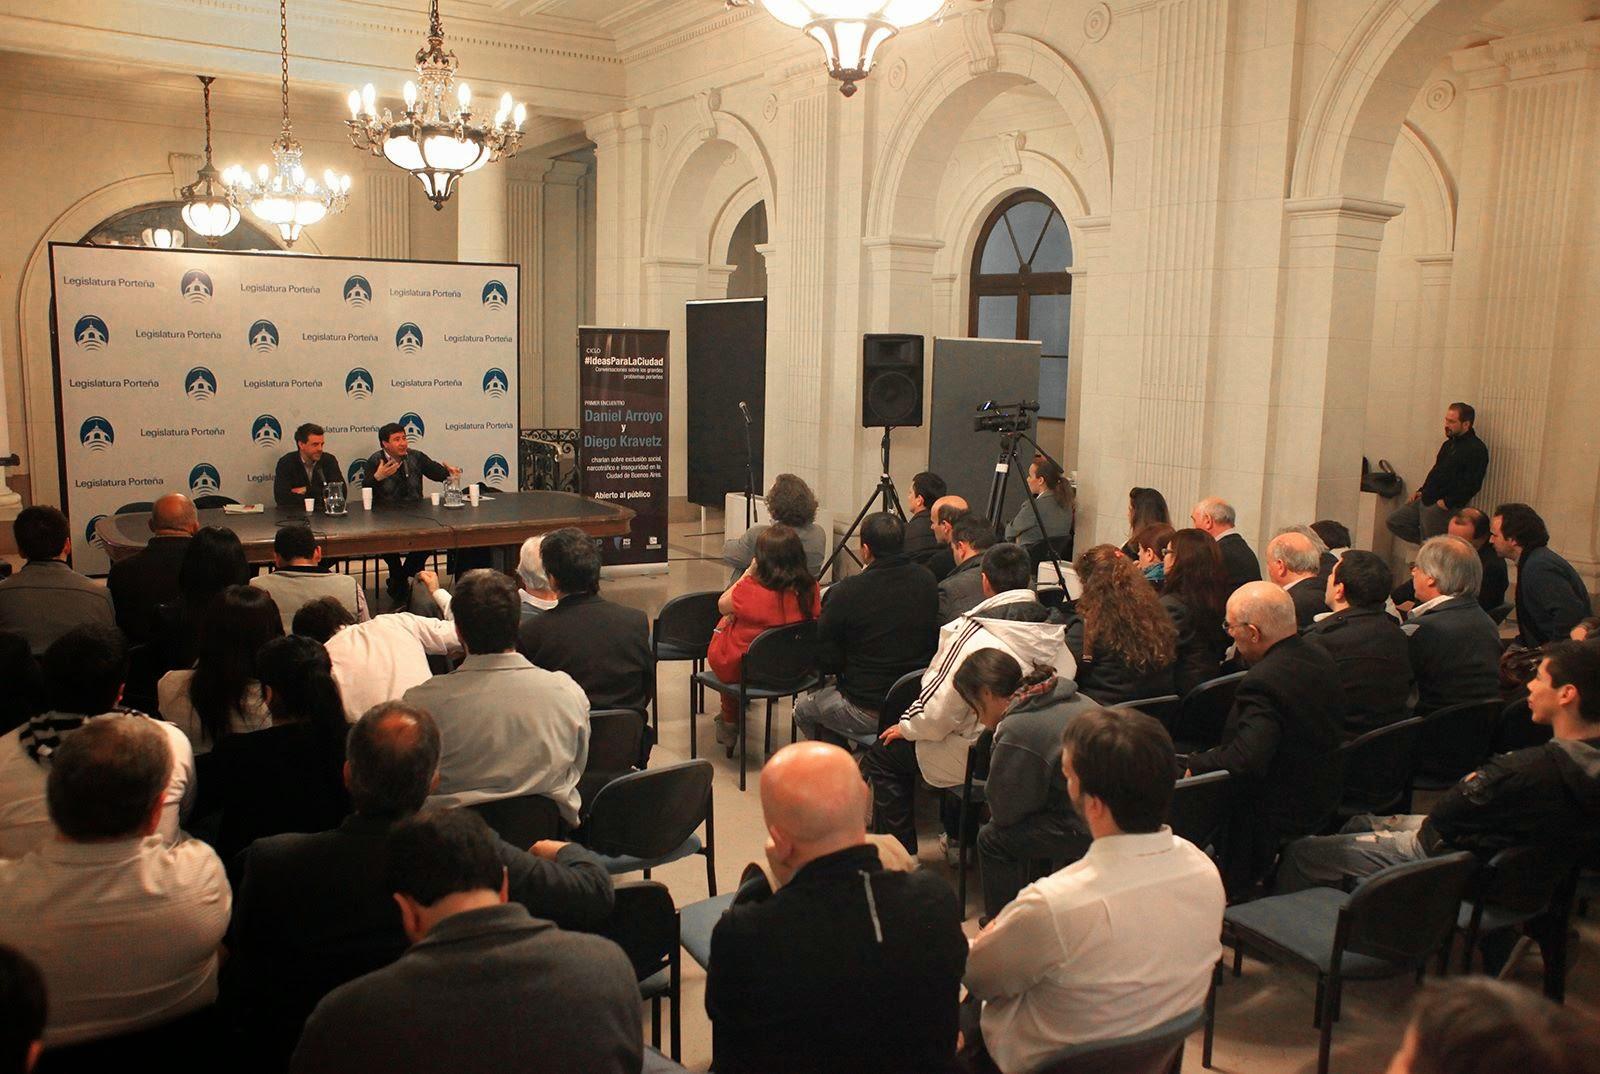 Diego_Kravetz-Legislatura_Porteña_IPP